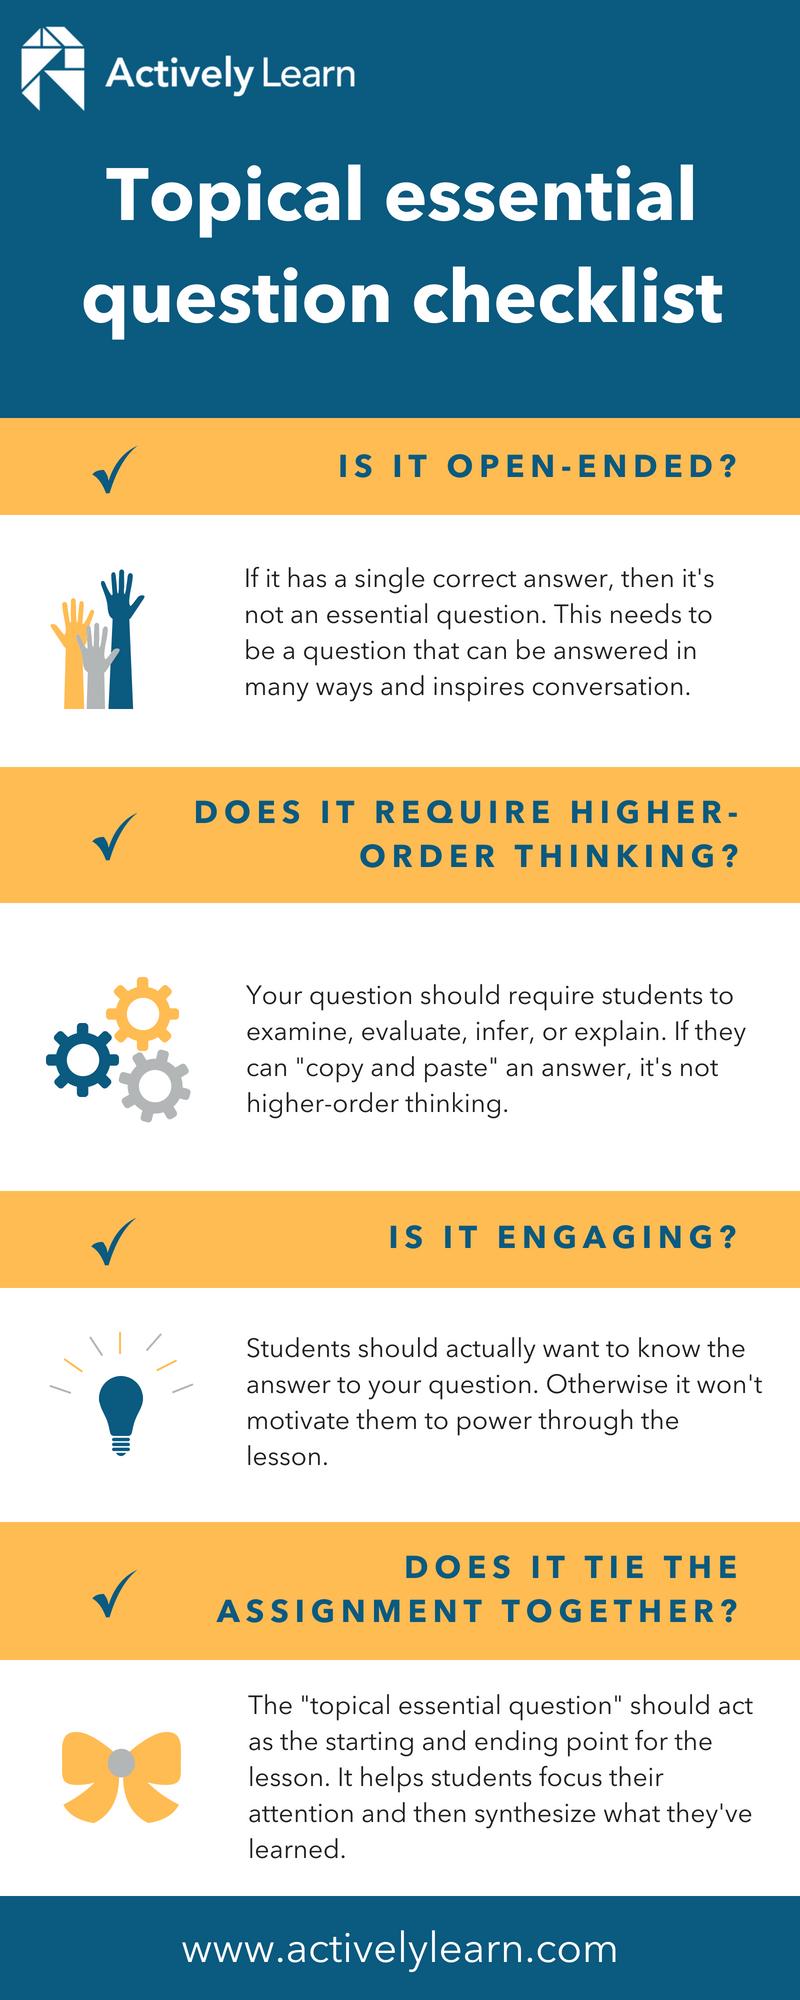 Topical essential question checklist